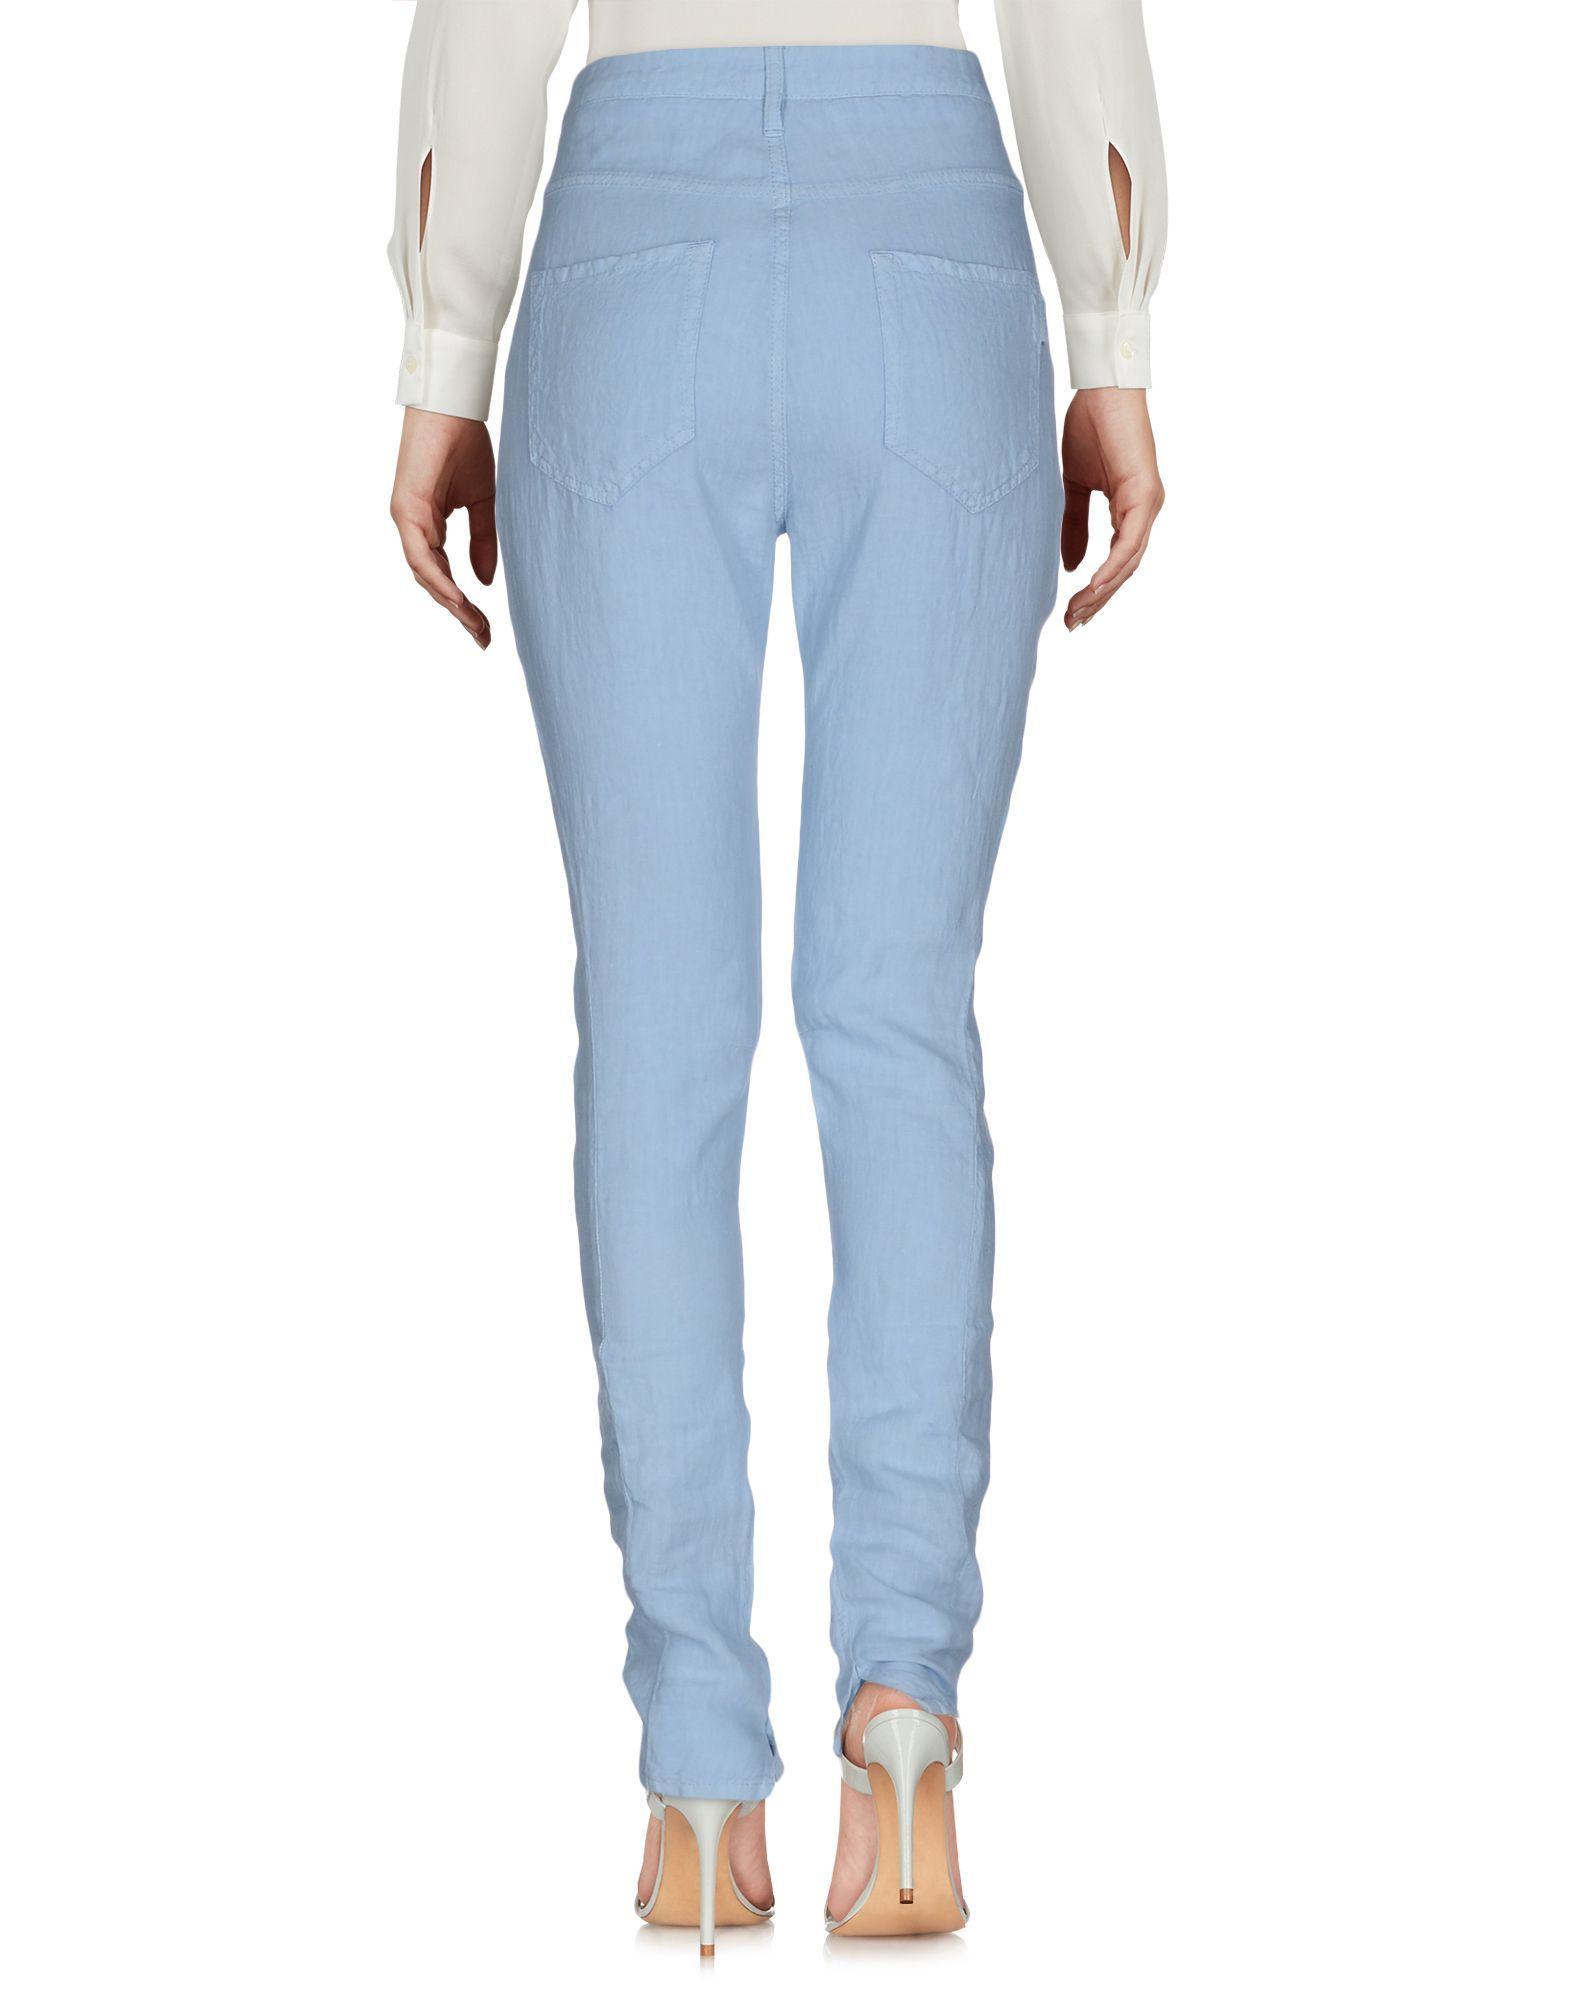 Manila Grace Sky Blue Linen Tapered Leg Trousers